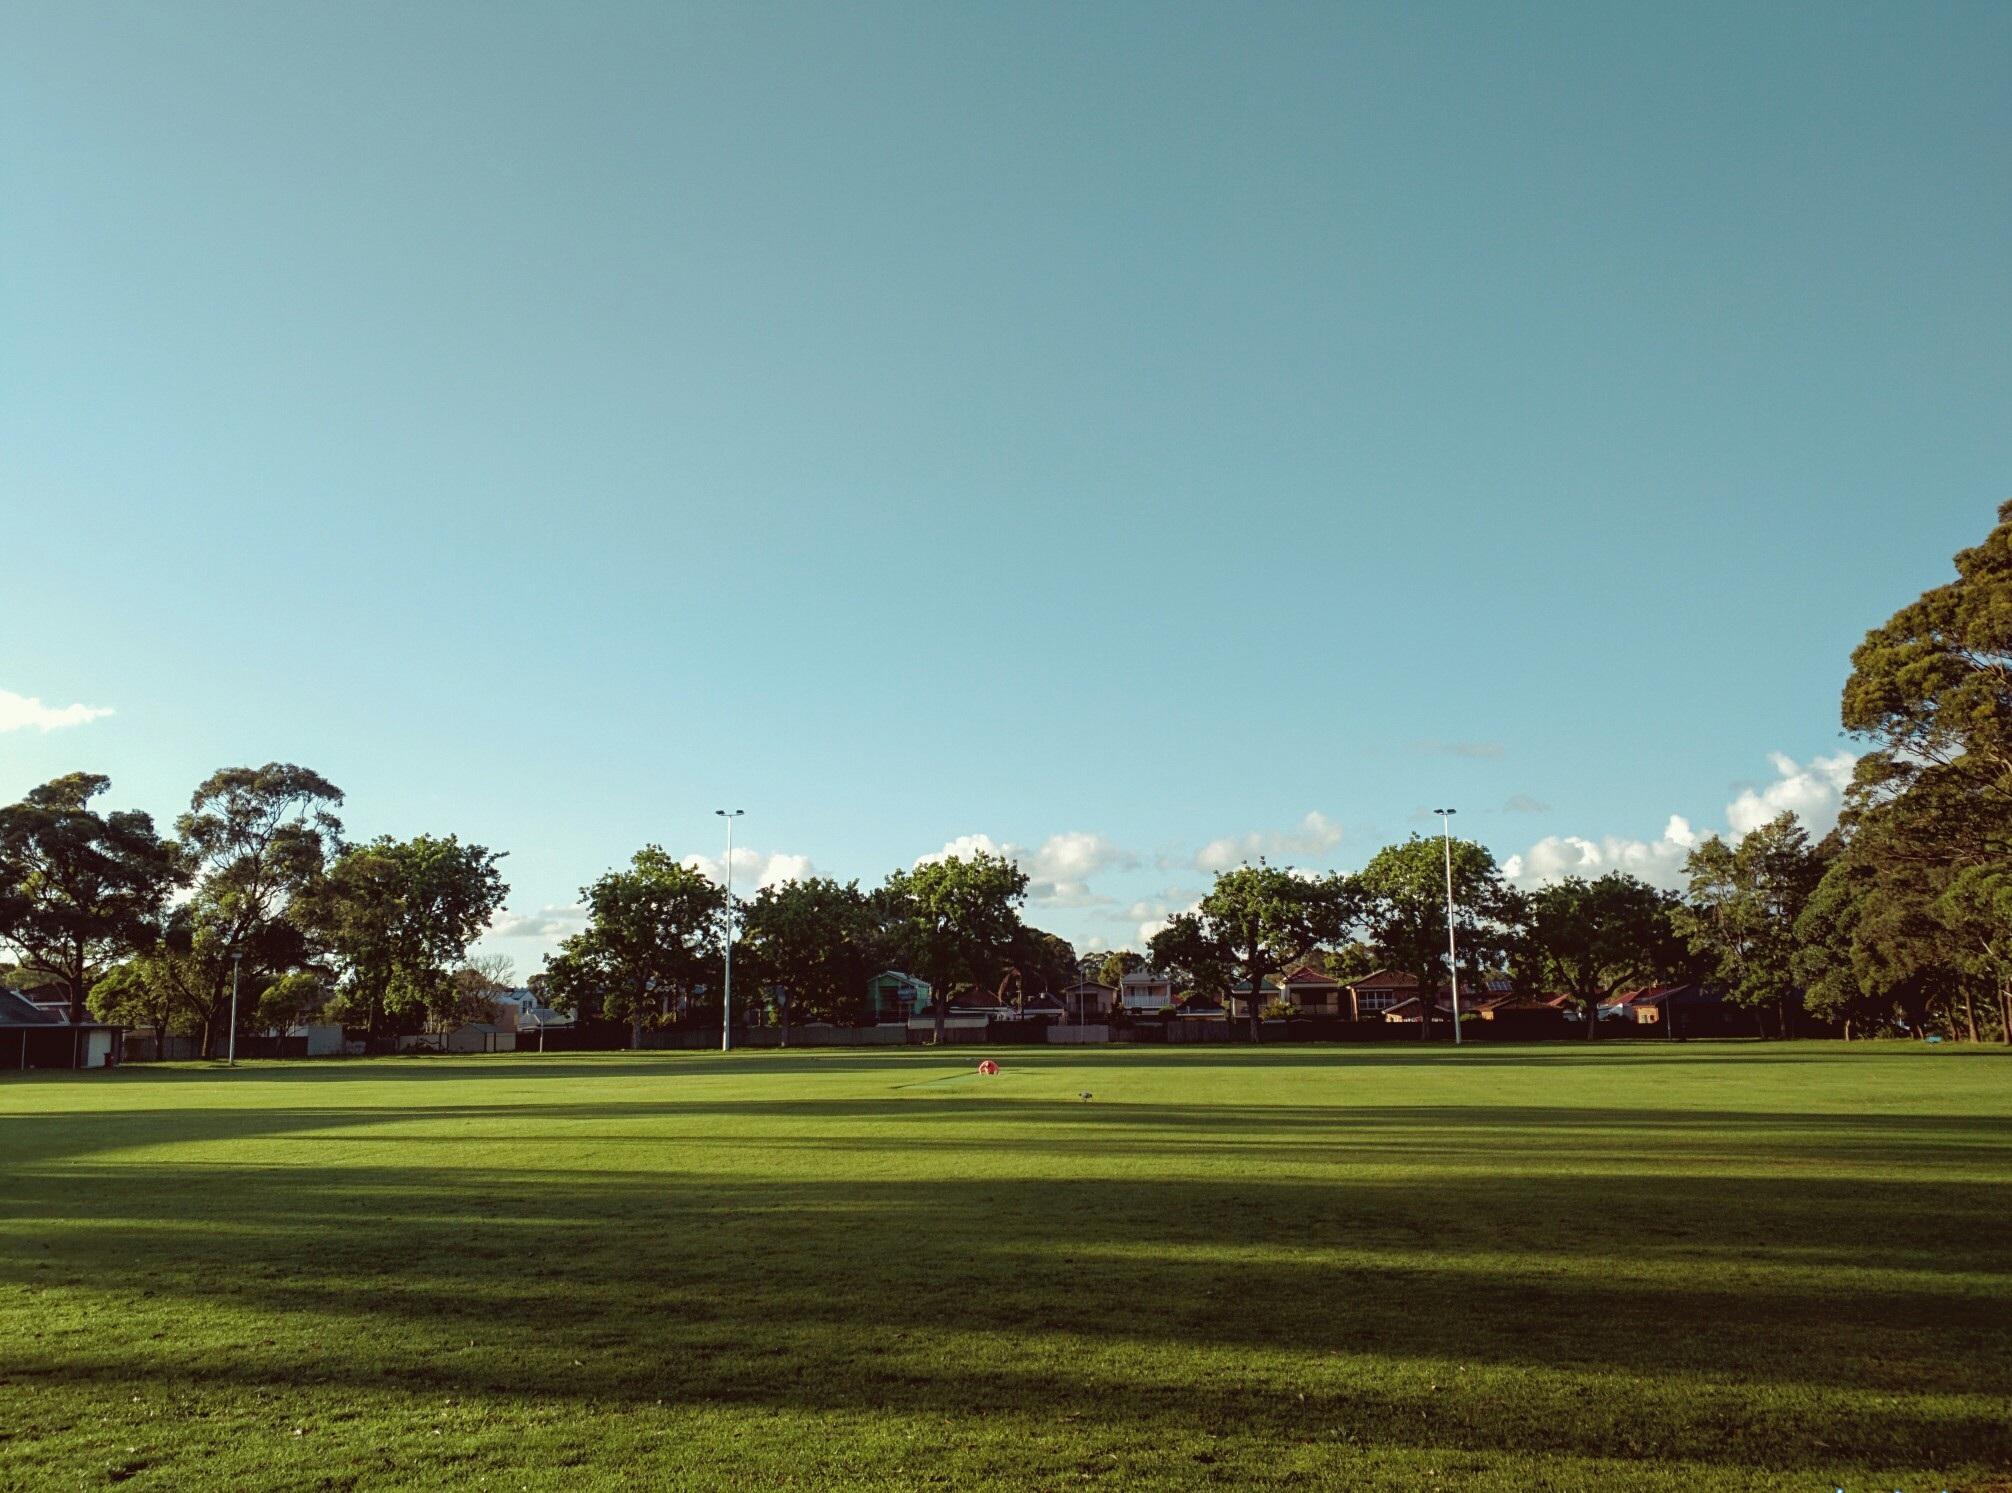 Our home ground at L'Estrange Park, Mascot